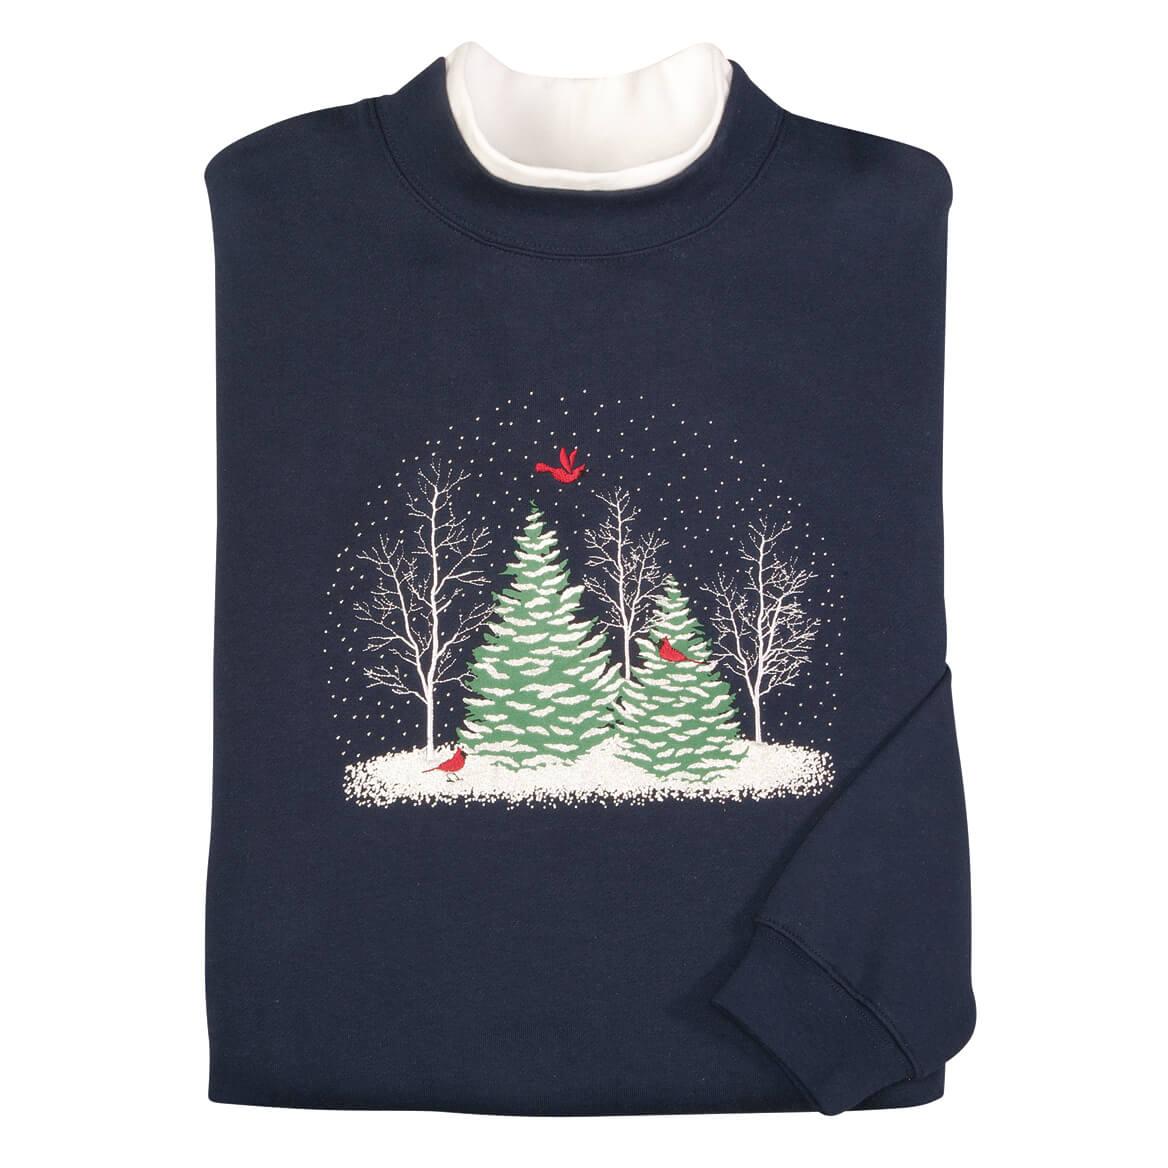 Snowglobe Trees Sweatshirt